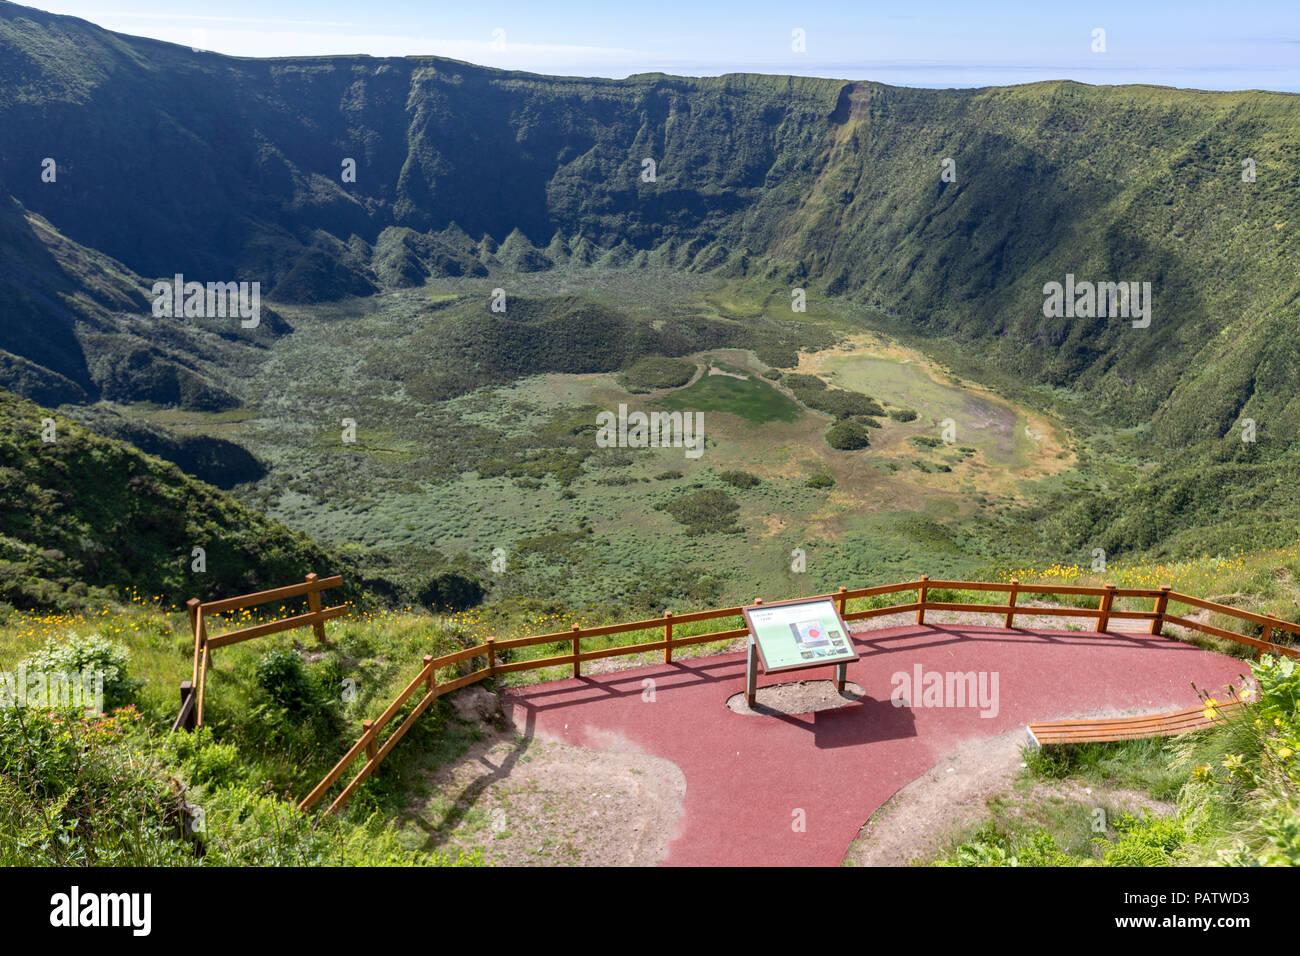 Viewpoint of the Caldeira do Cabeço Gordo, stratovolcano , in Faial island, Azores, Portugal - Stock Image